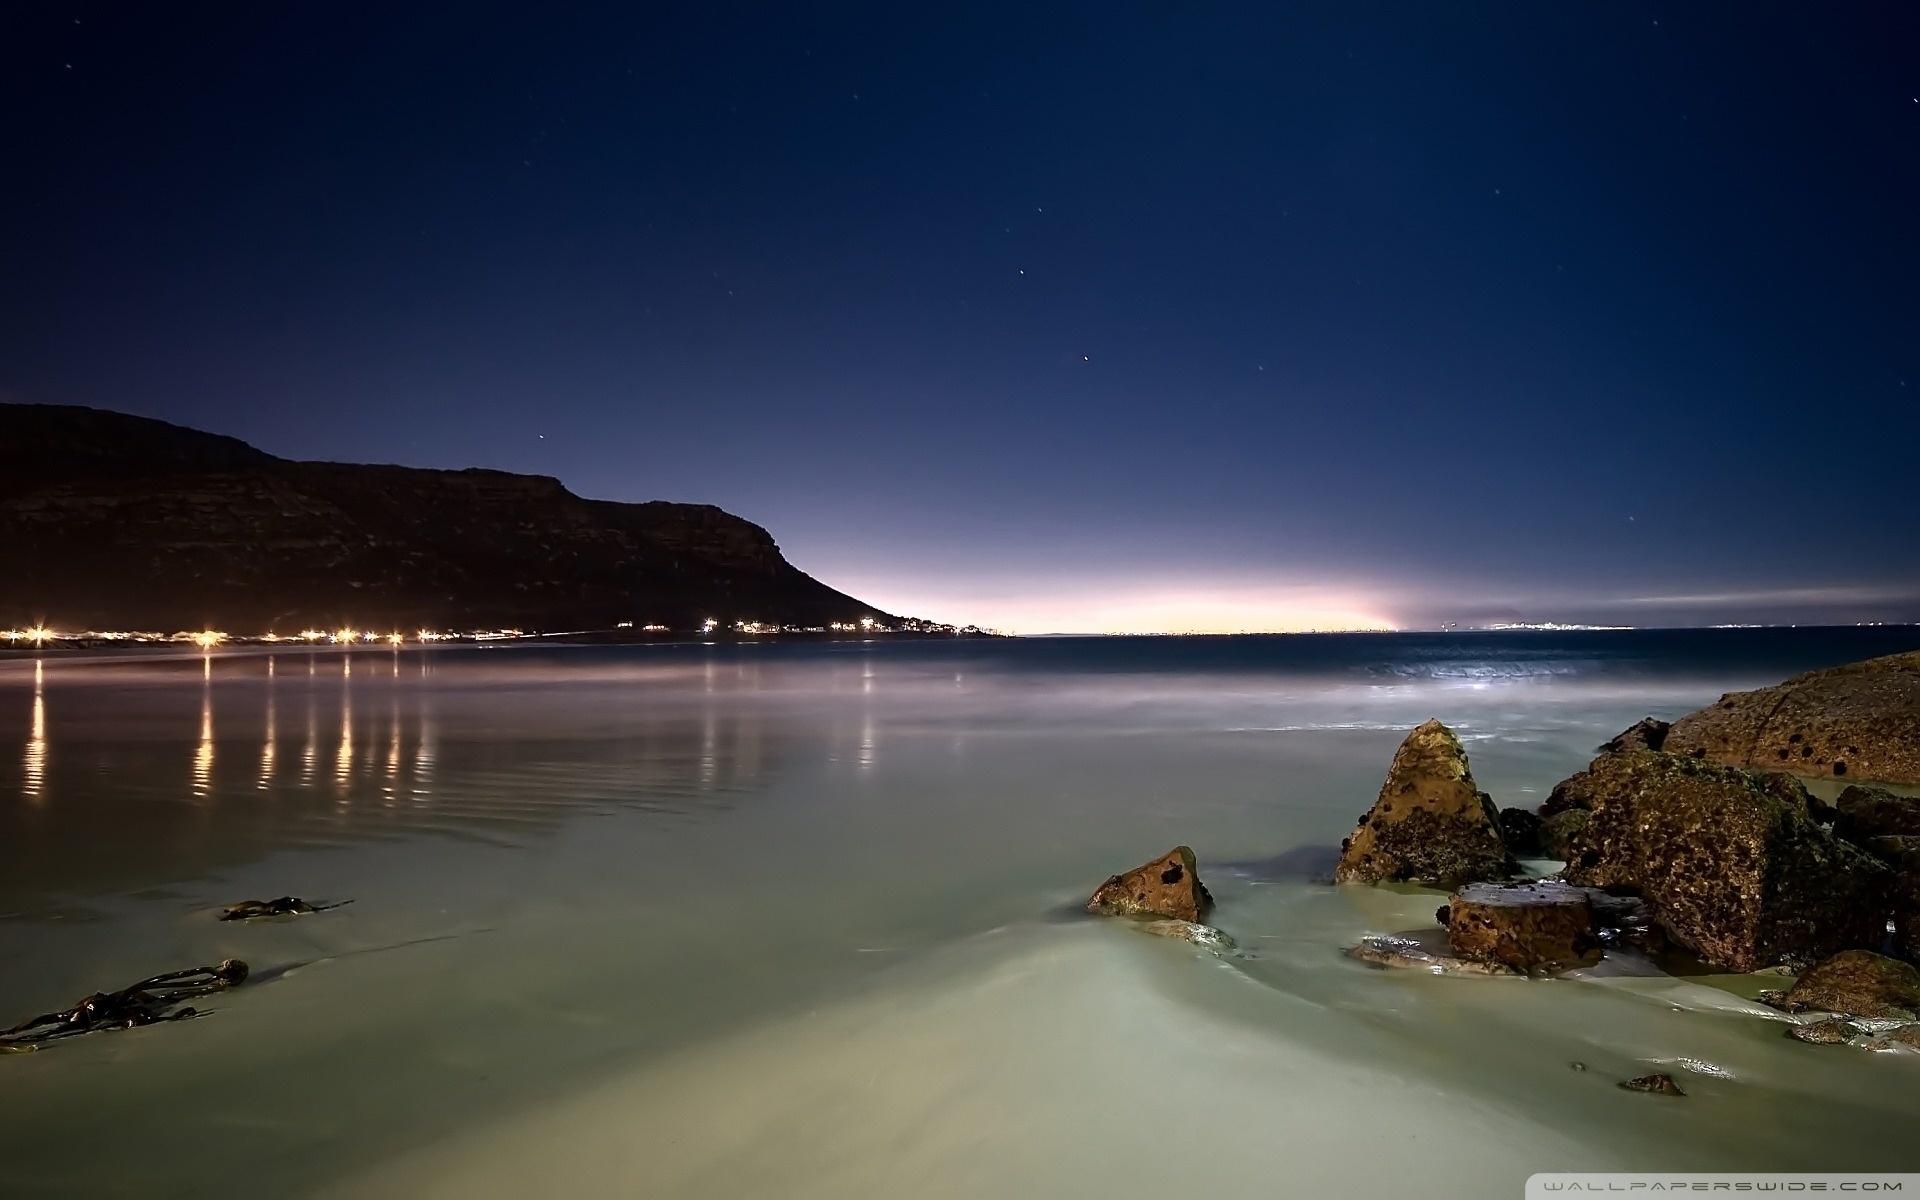 beach at night ❤ 4k hd desktop wallpaper for 4k ultra hd tv